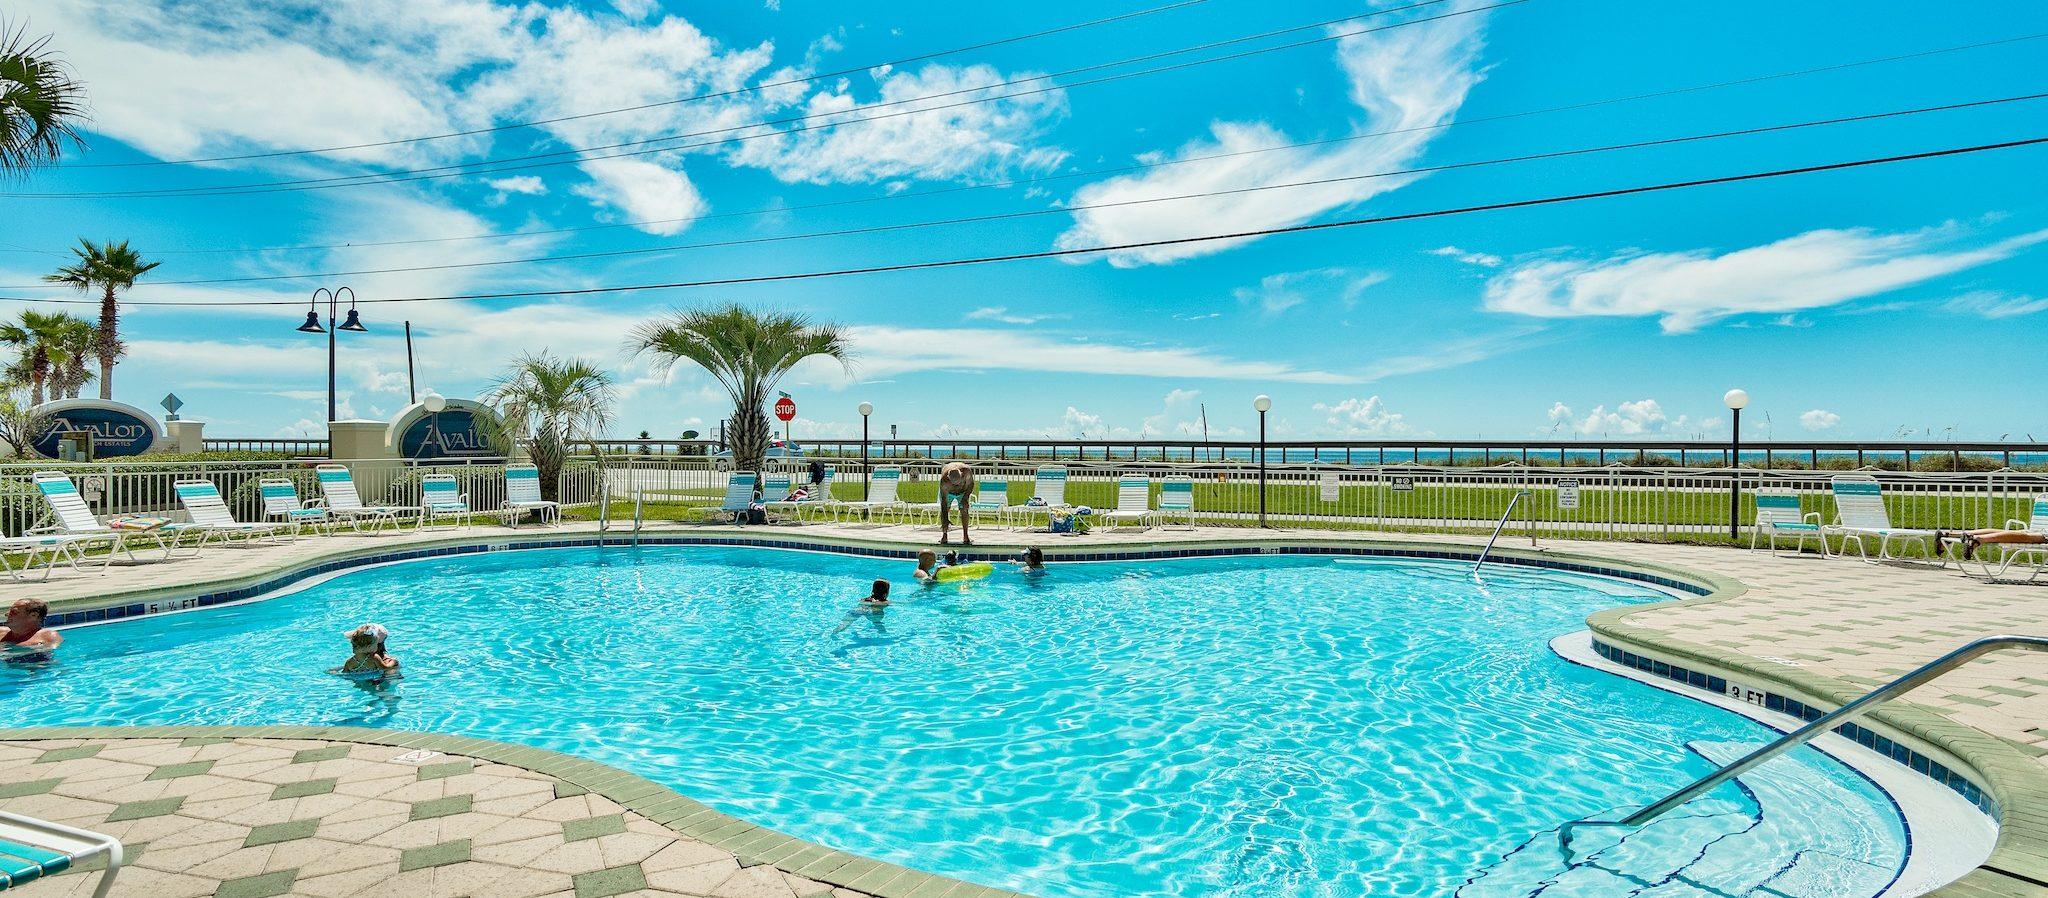 We have pet friendly beach rentals at Maravilla Resort.